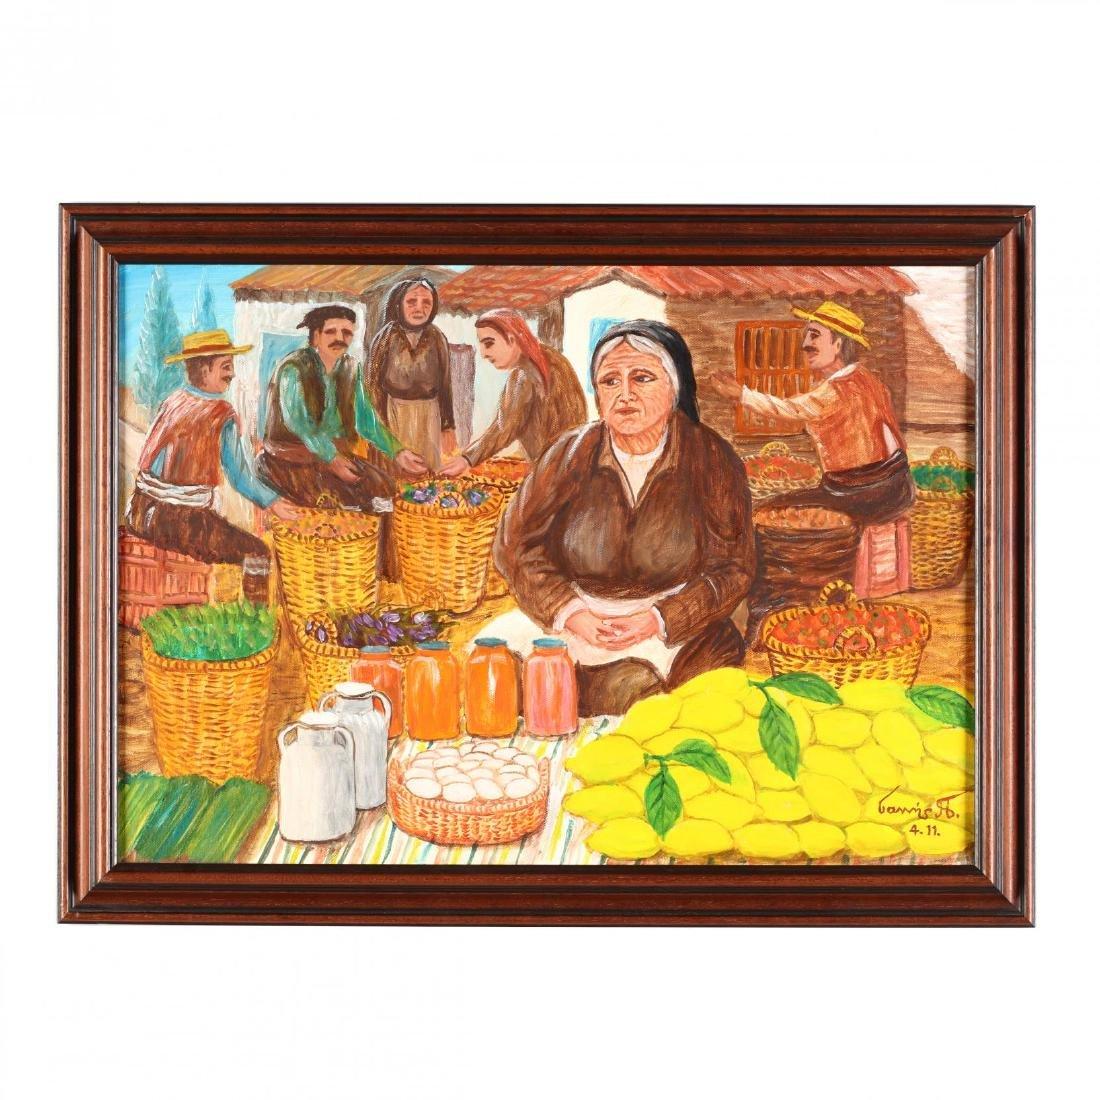 Yiannis Pelekanos (Cypriot, b. 1937), The Market Vendor